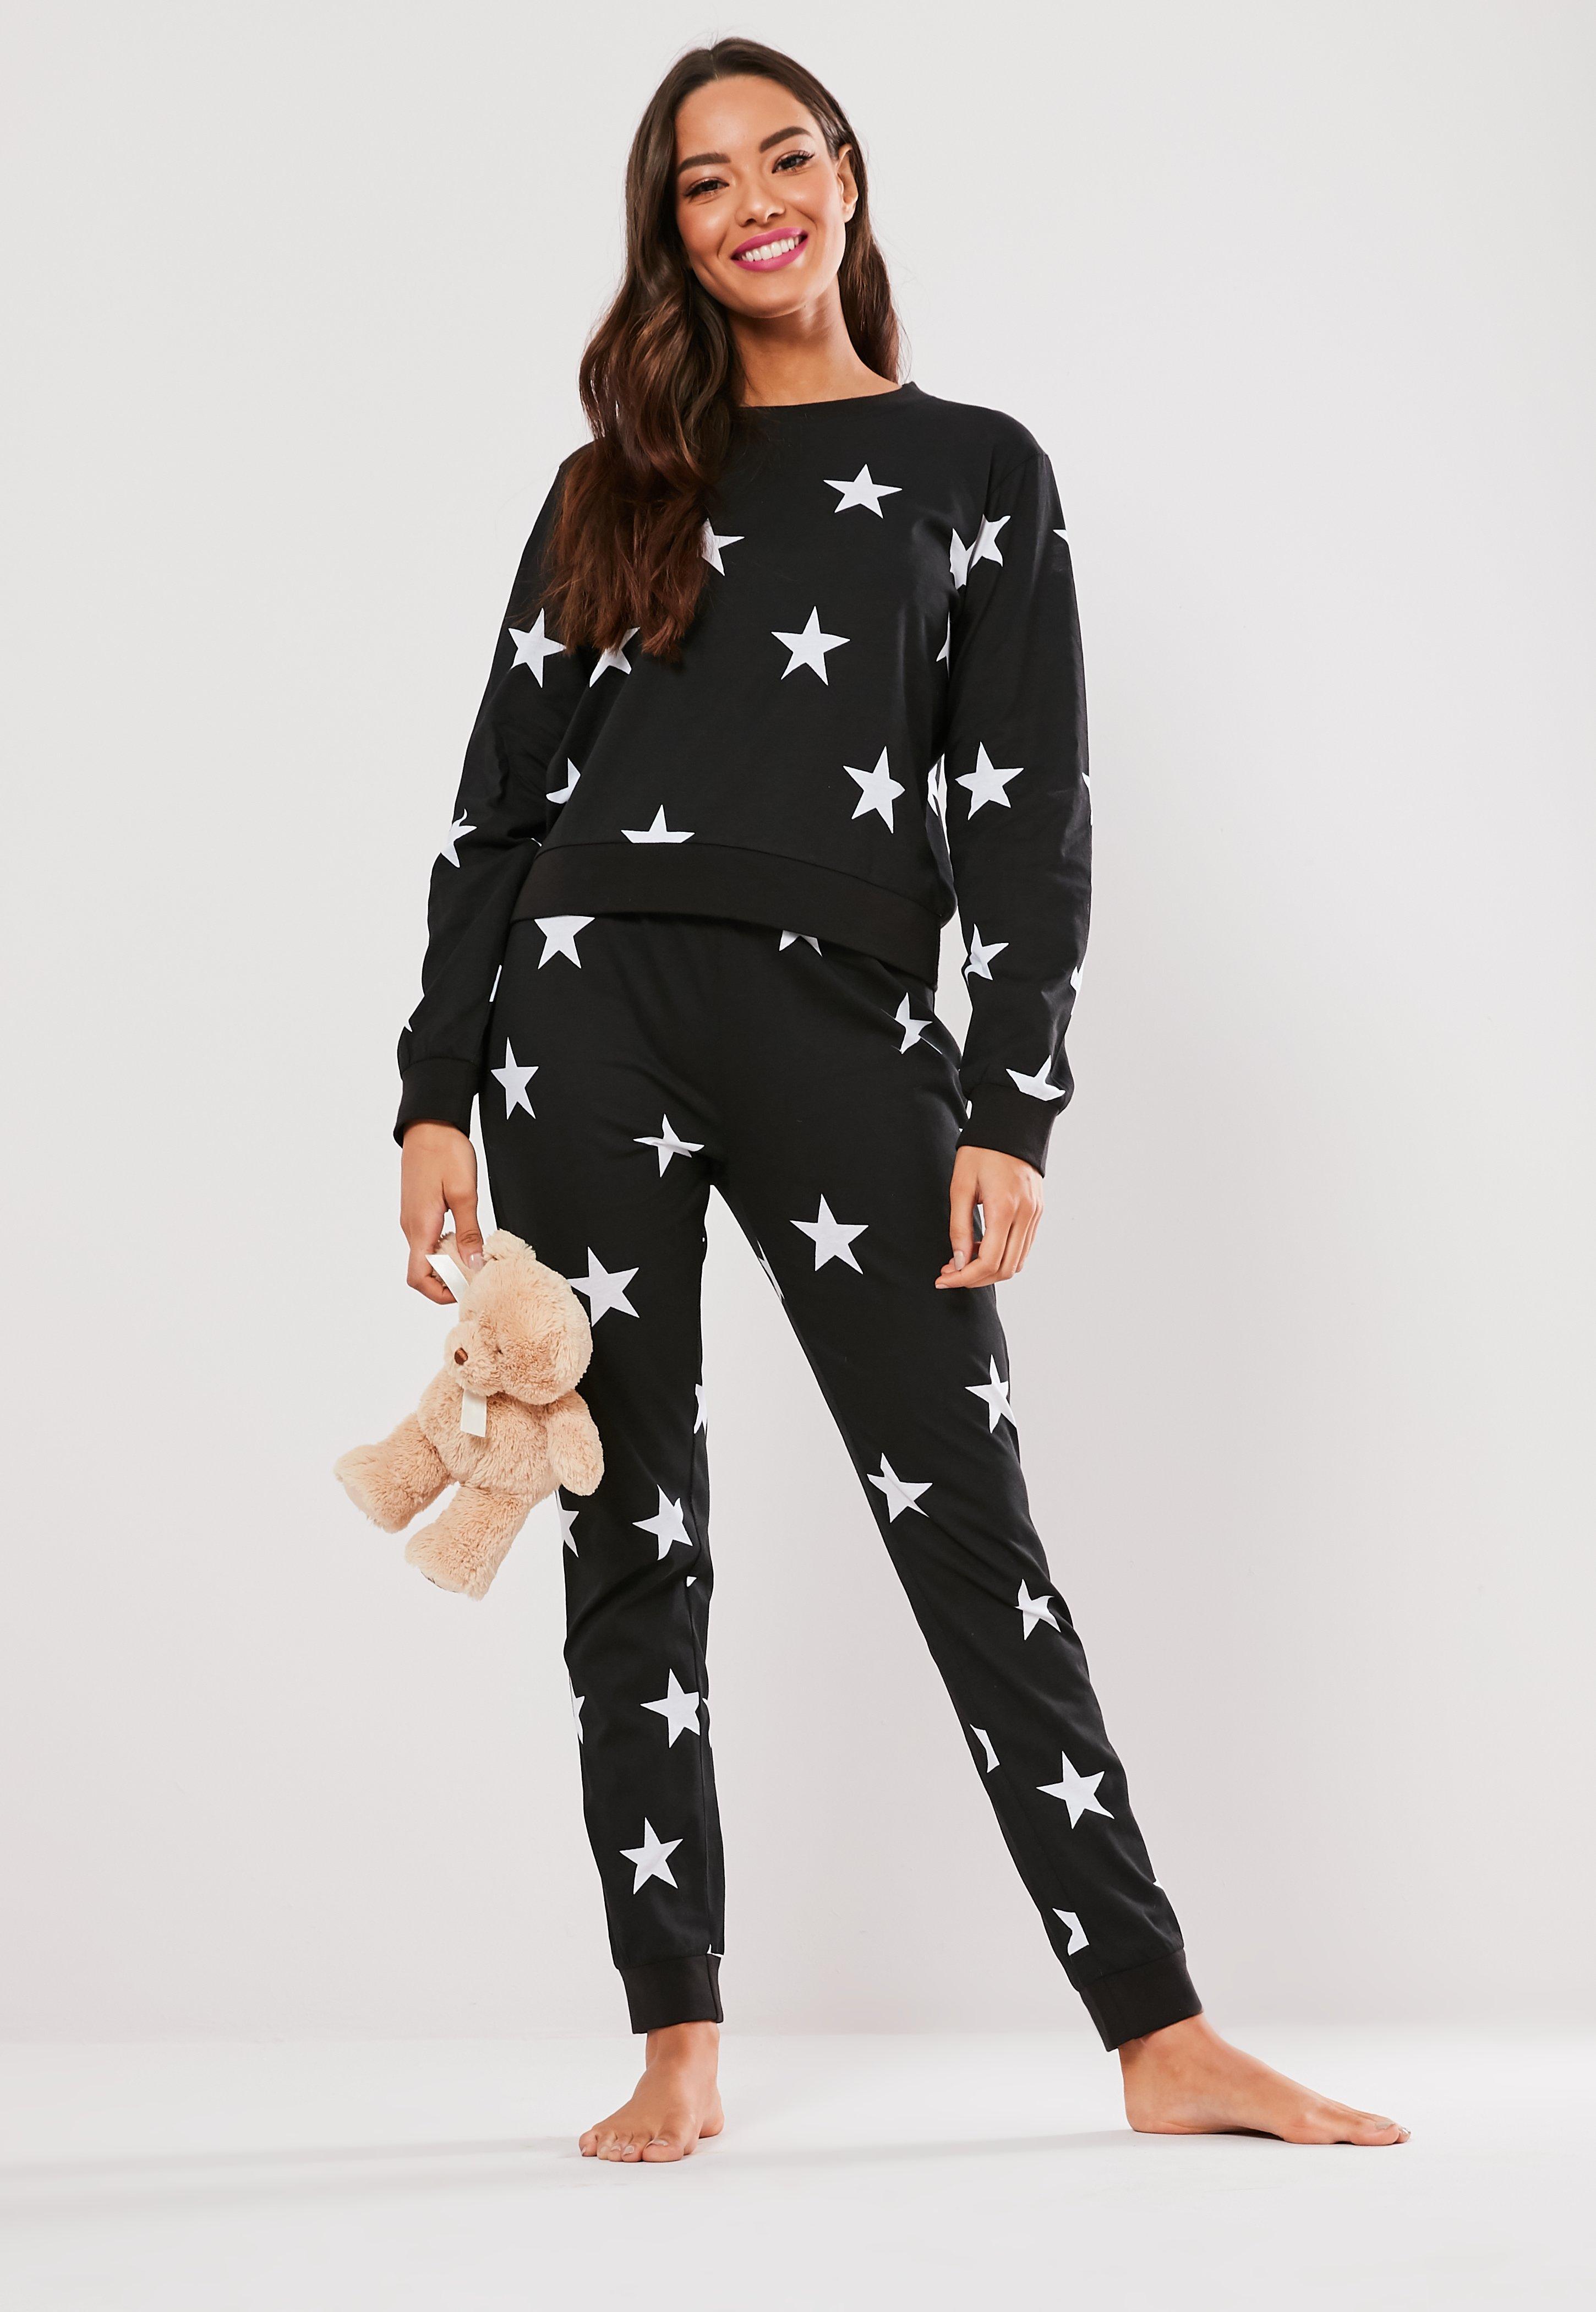 06b5788368c05 Women s Pajamas - PJ s for Women